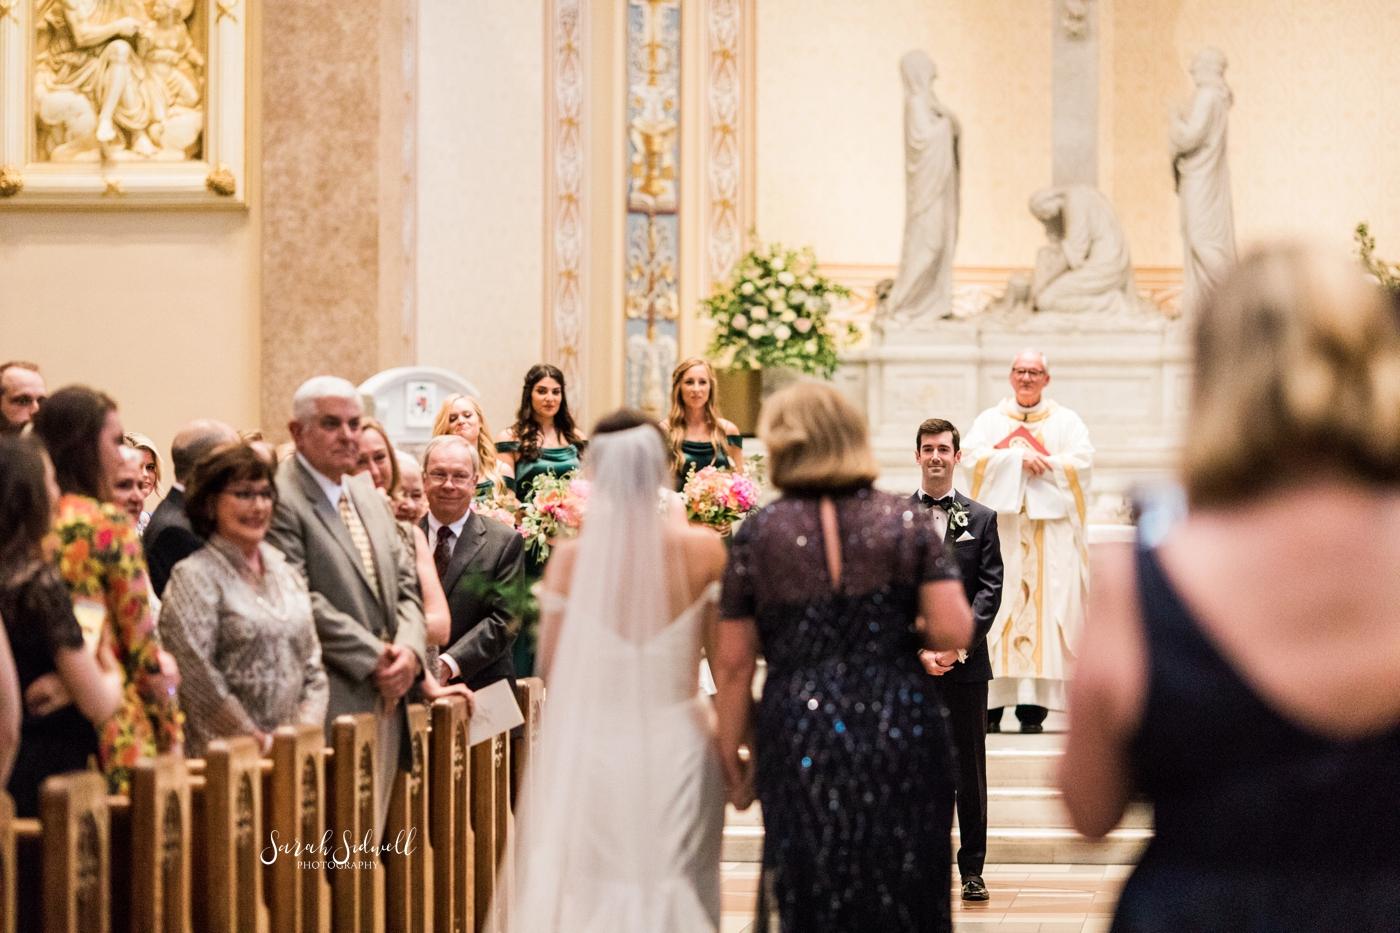 Cathedral of the Incarnation Wedding | Elizabeth & Ryan